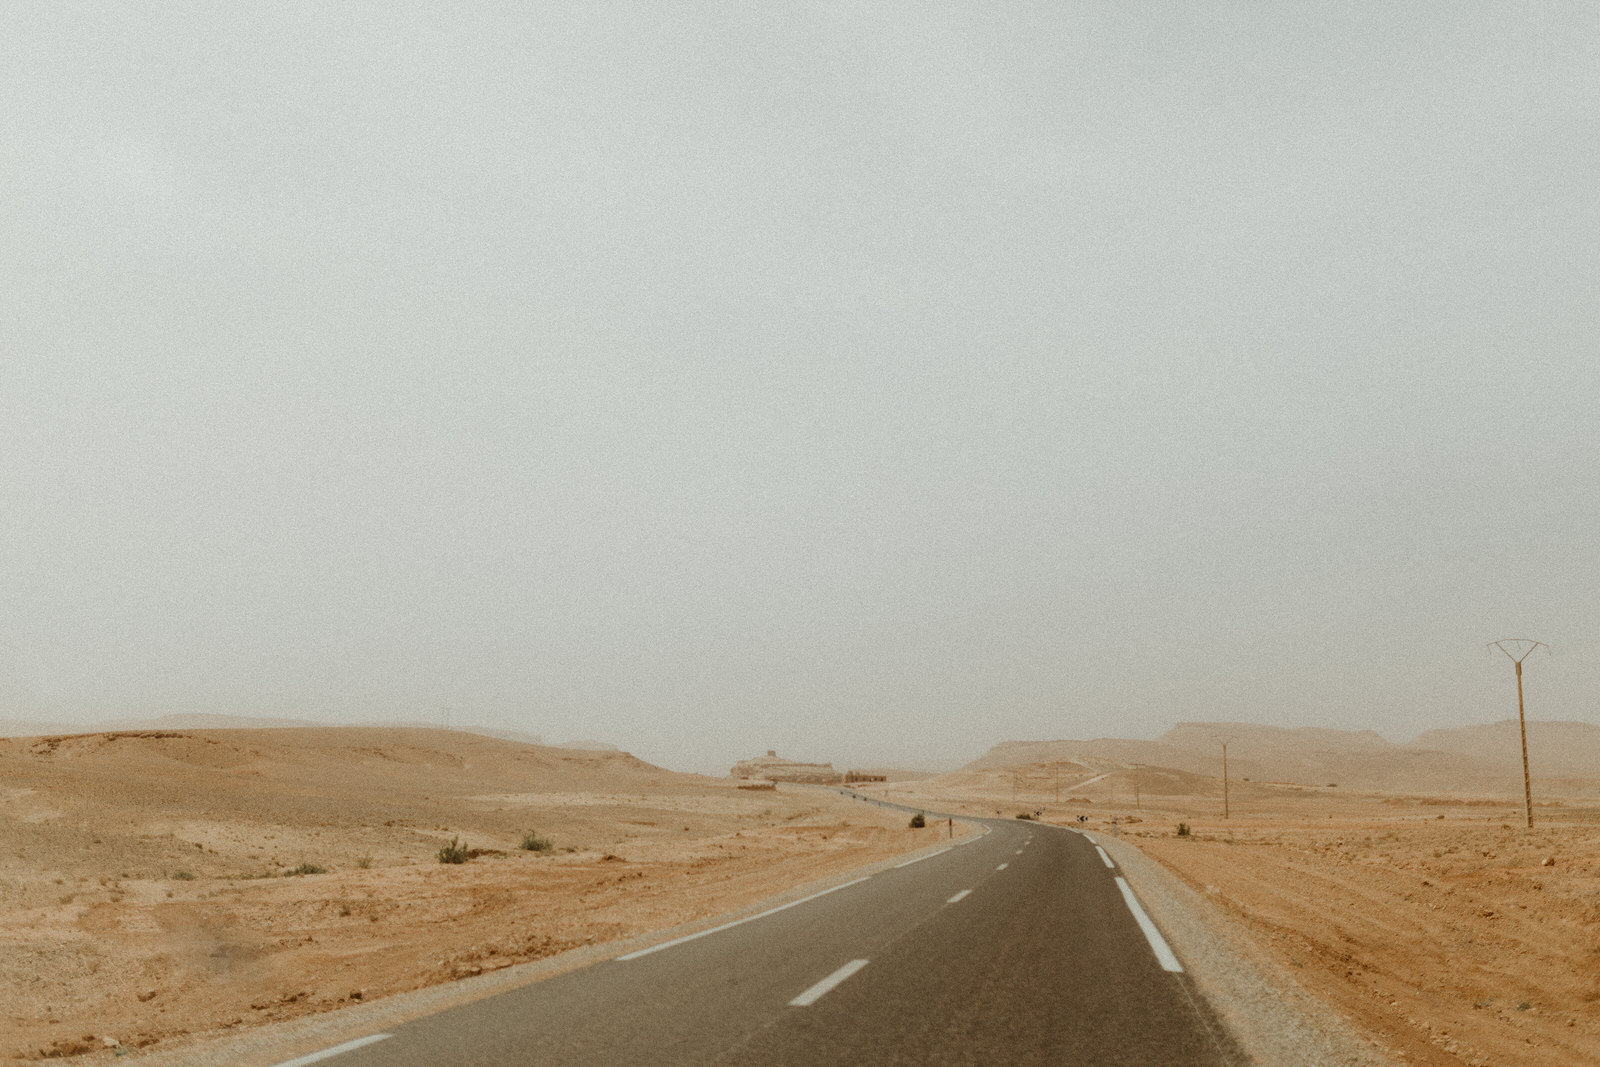 desert-road-from-sunrise-to-sunset-photographer-session-love